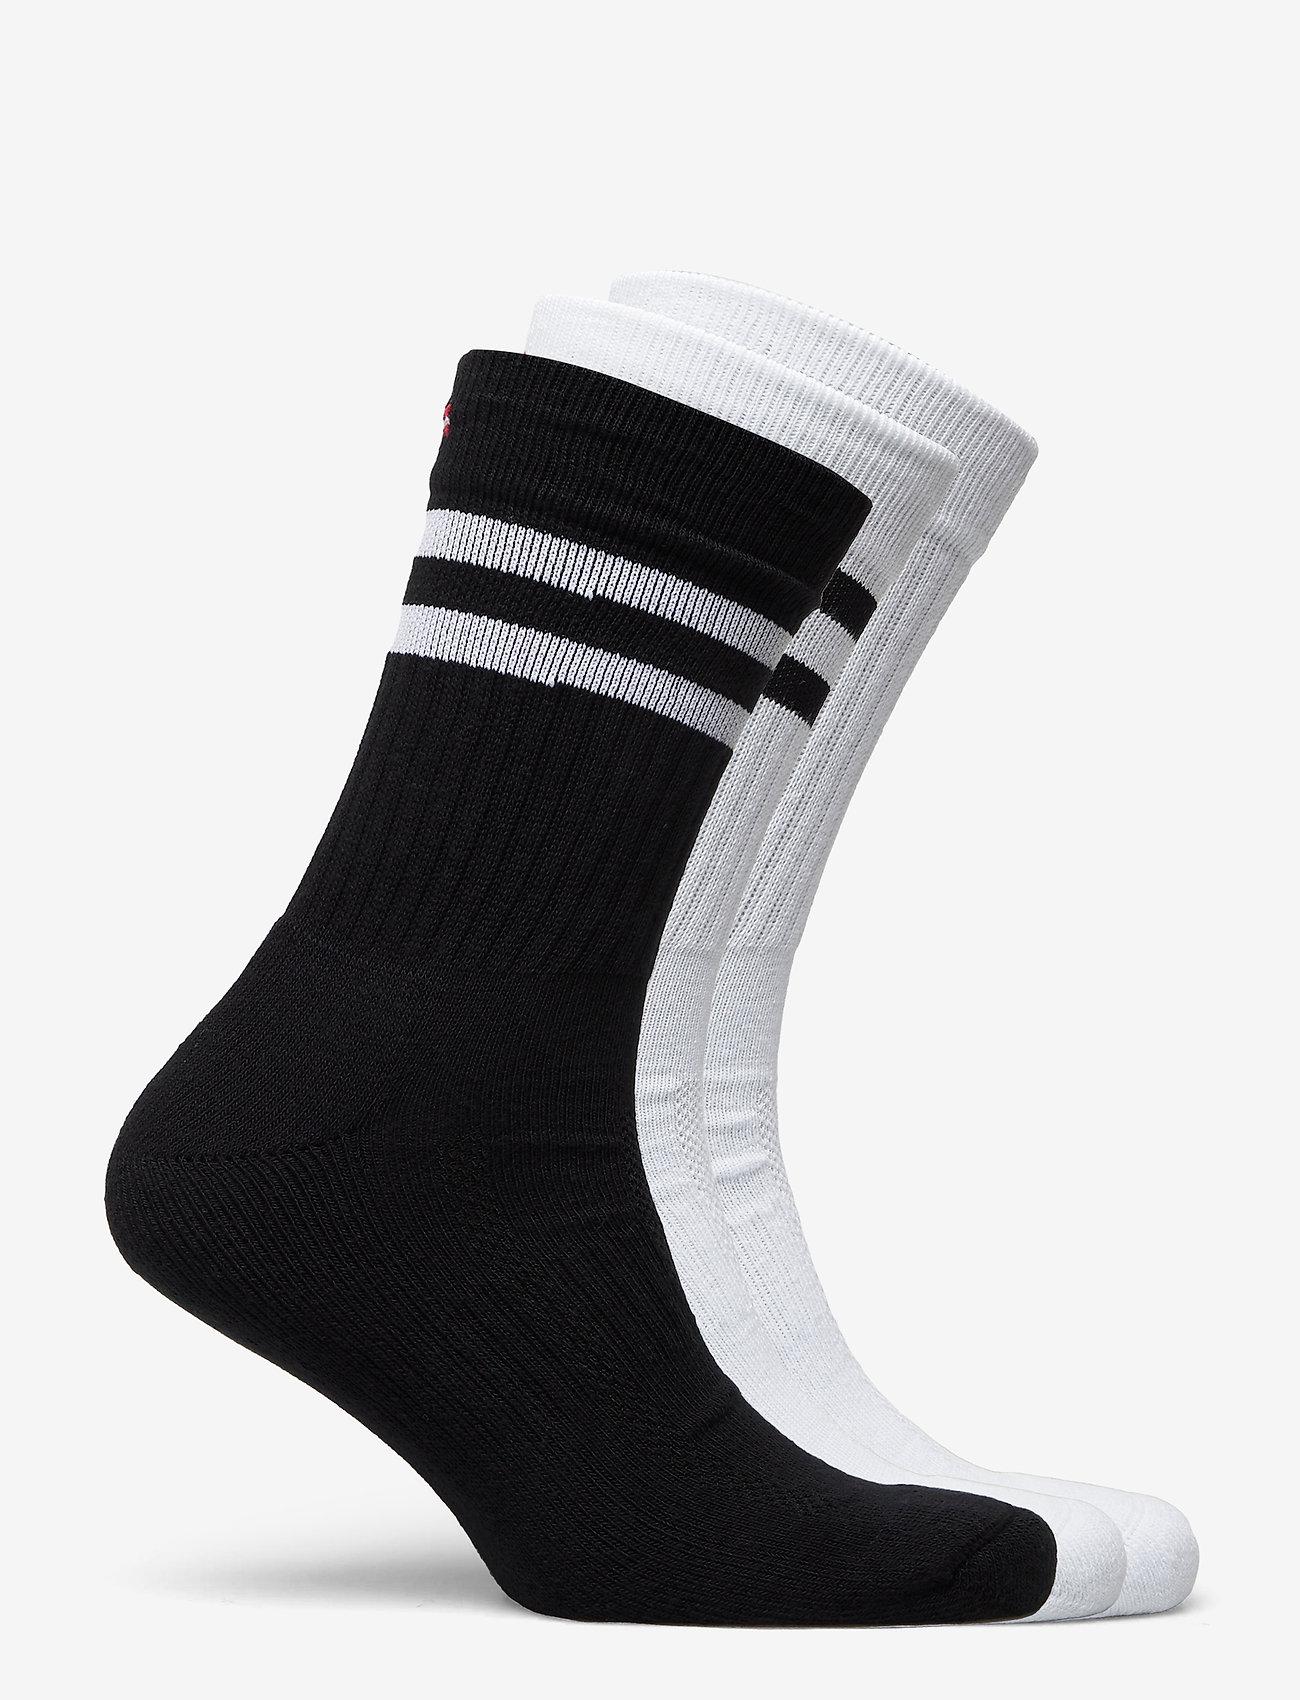 Danish Endurance - Tennis Performance Crew Socks 3 Pack - kousen - multicolour (1x black/white, 1x white, 1x white/black) - 1